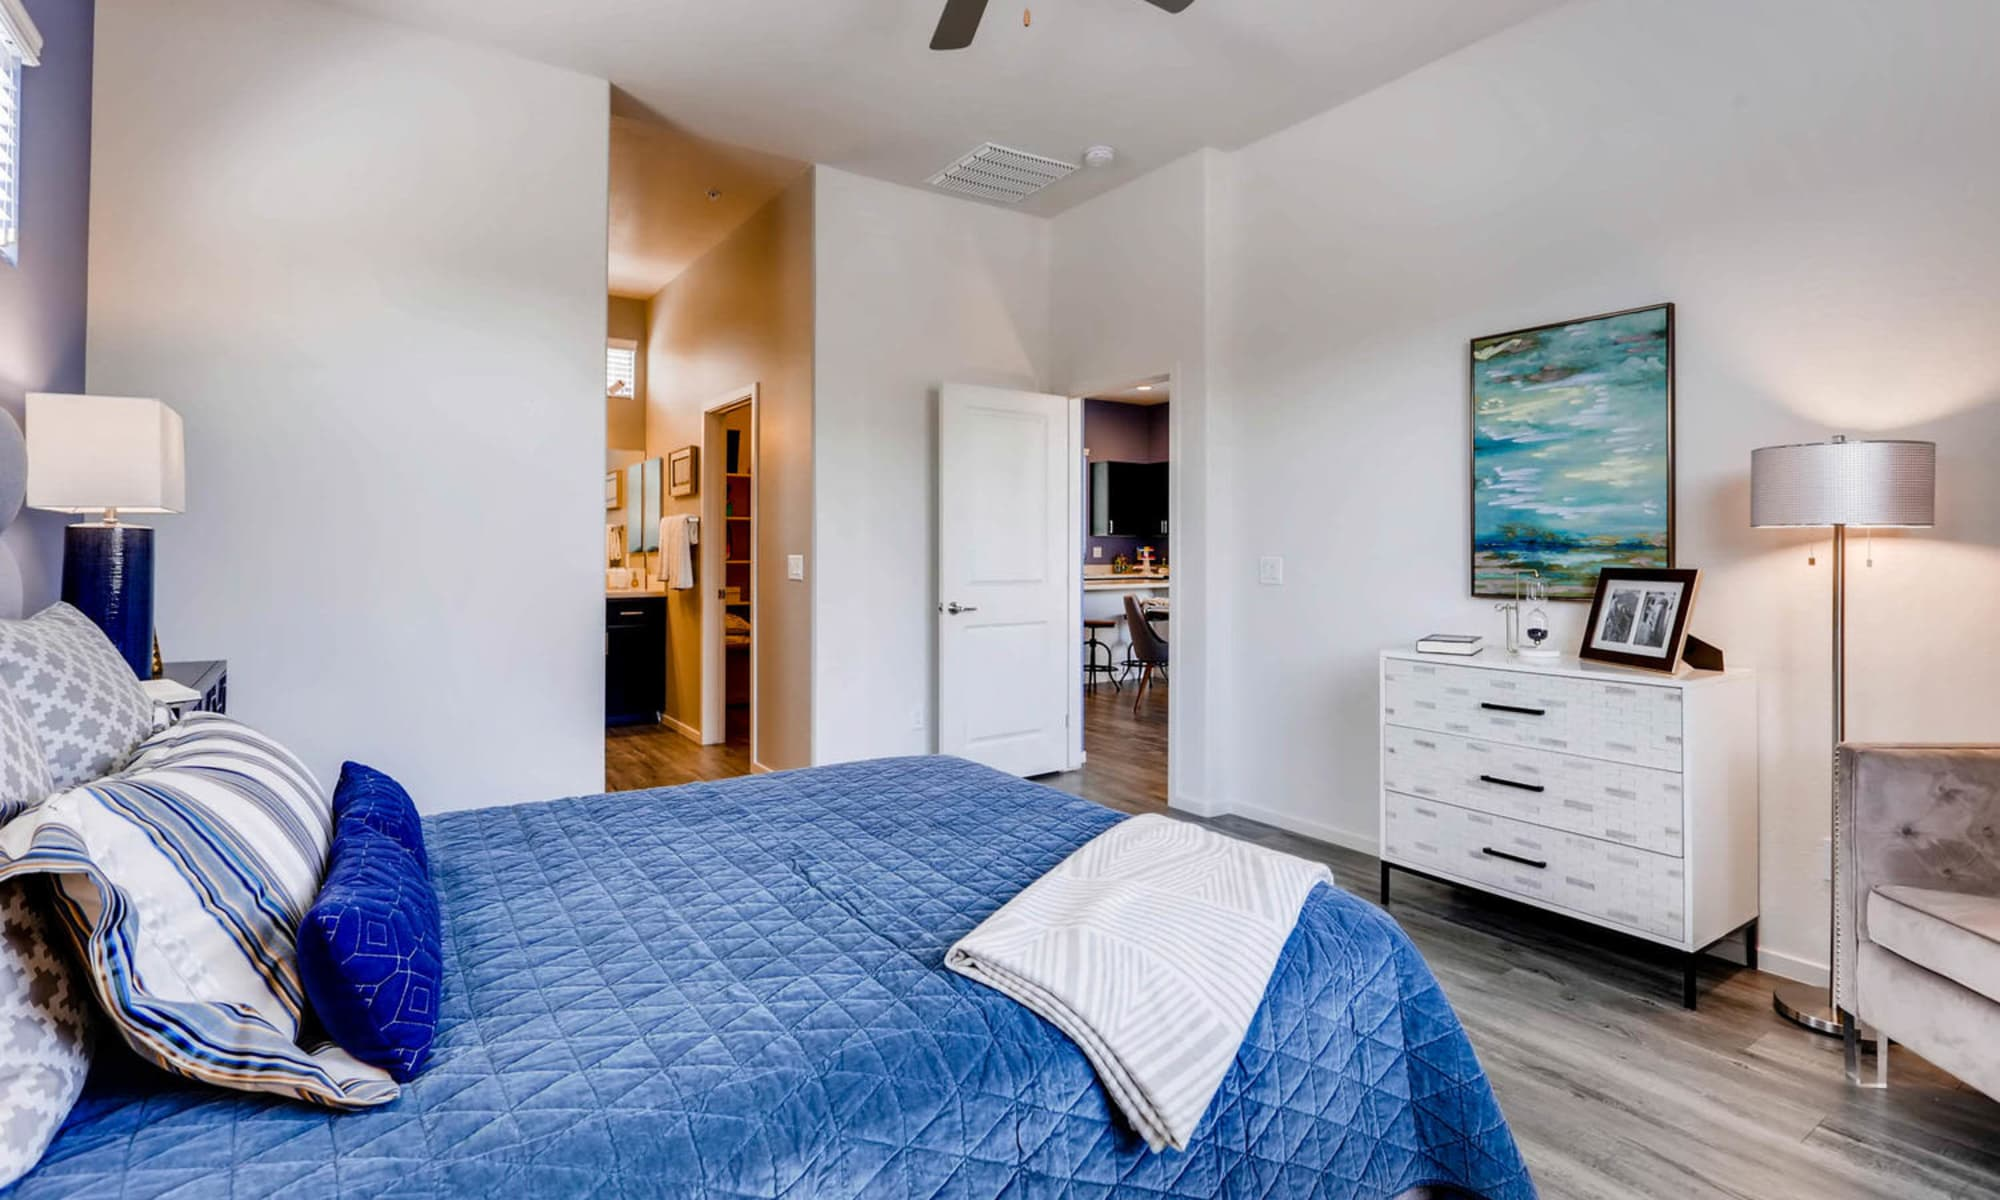 Master bedroom at Avilla Meadows in Surprise, Arizona